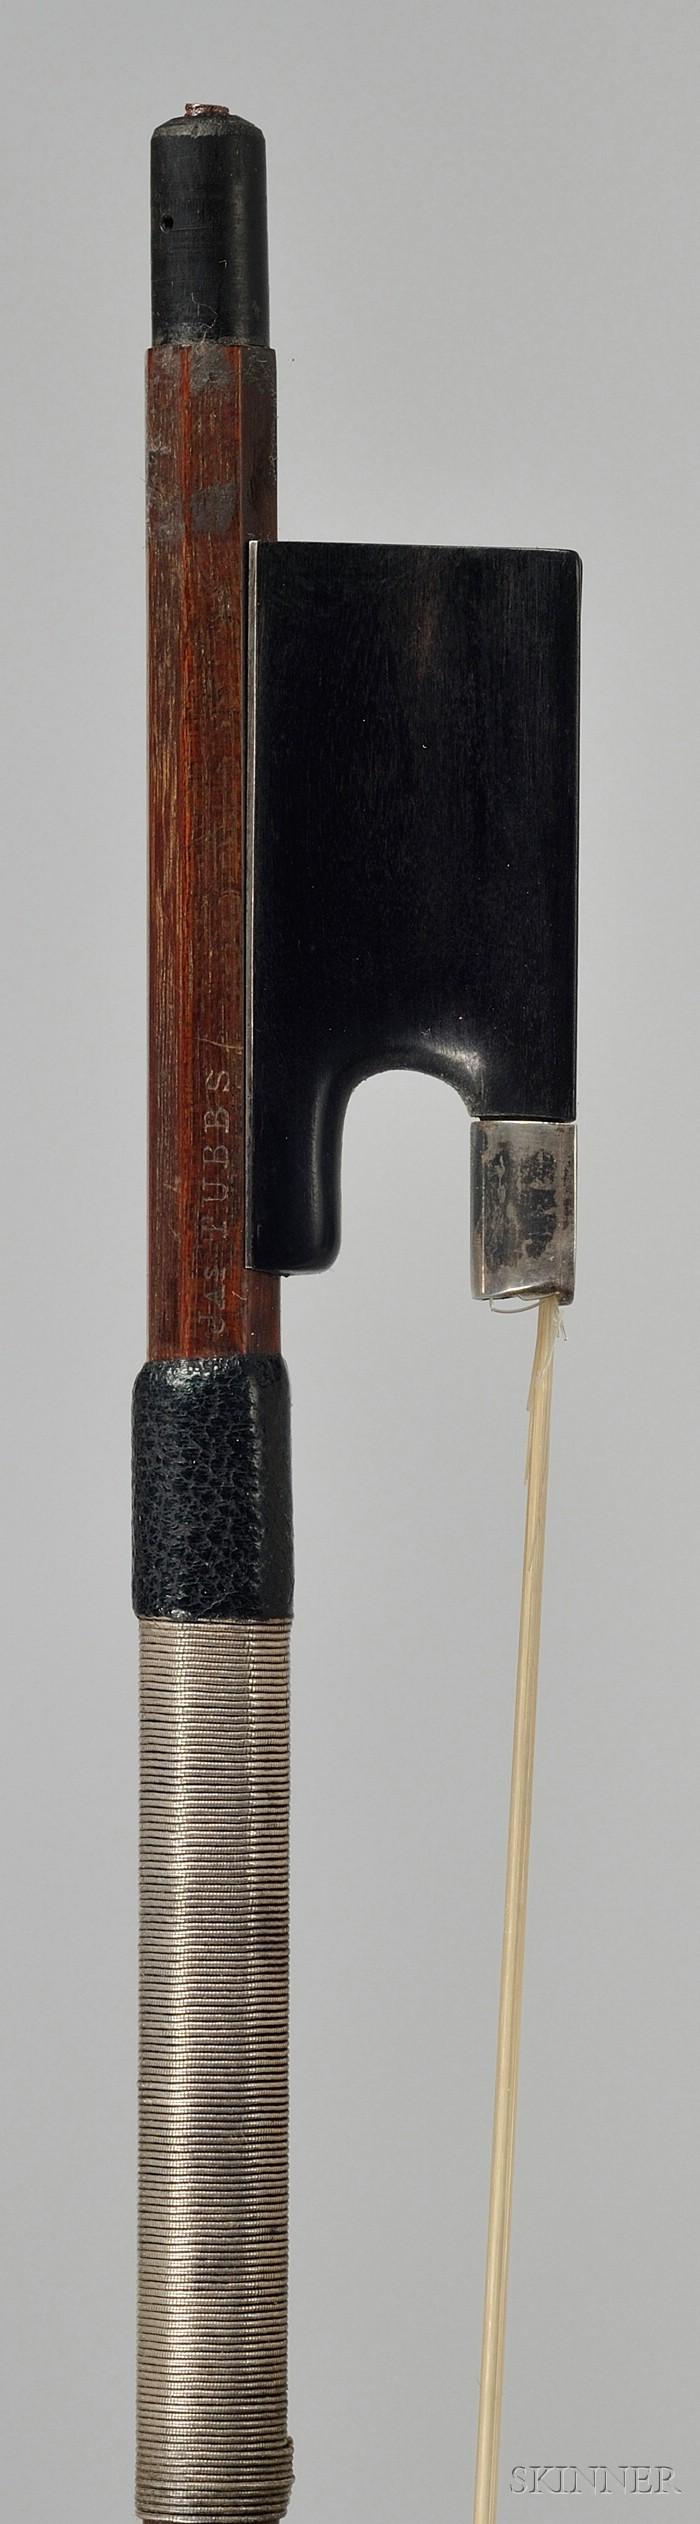 English Silver Mounted Violin Bow, James Tubbs